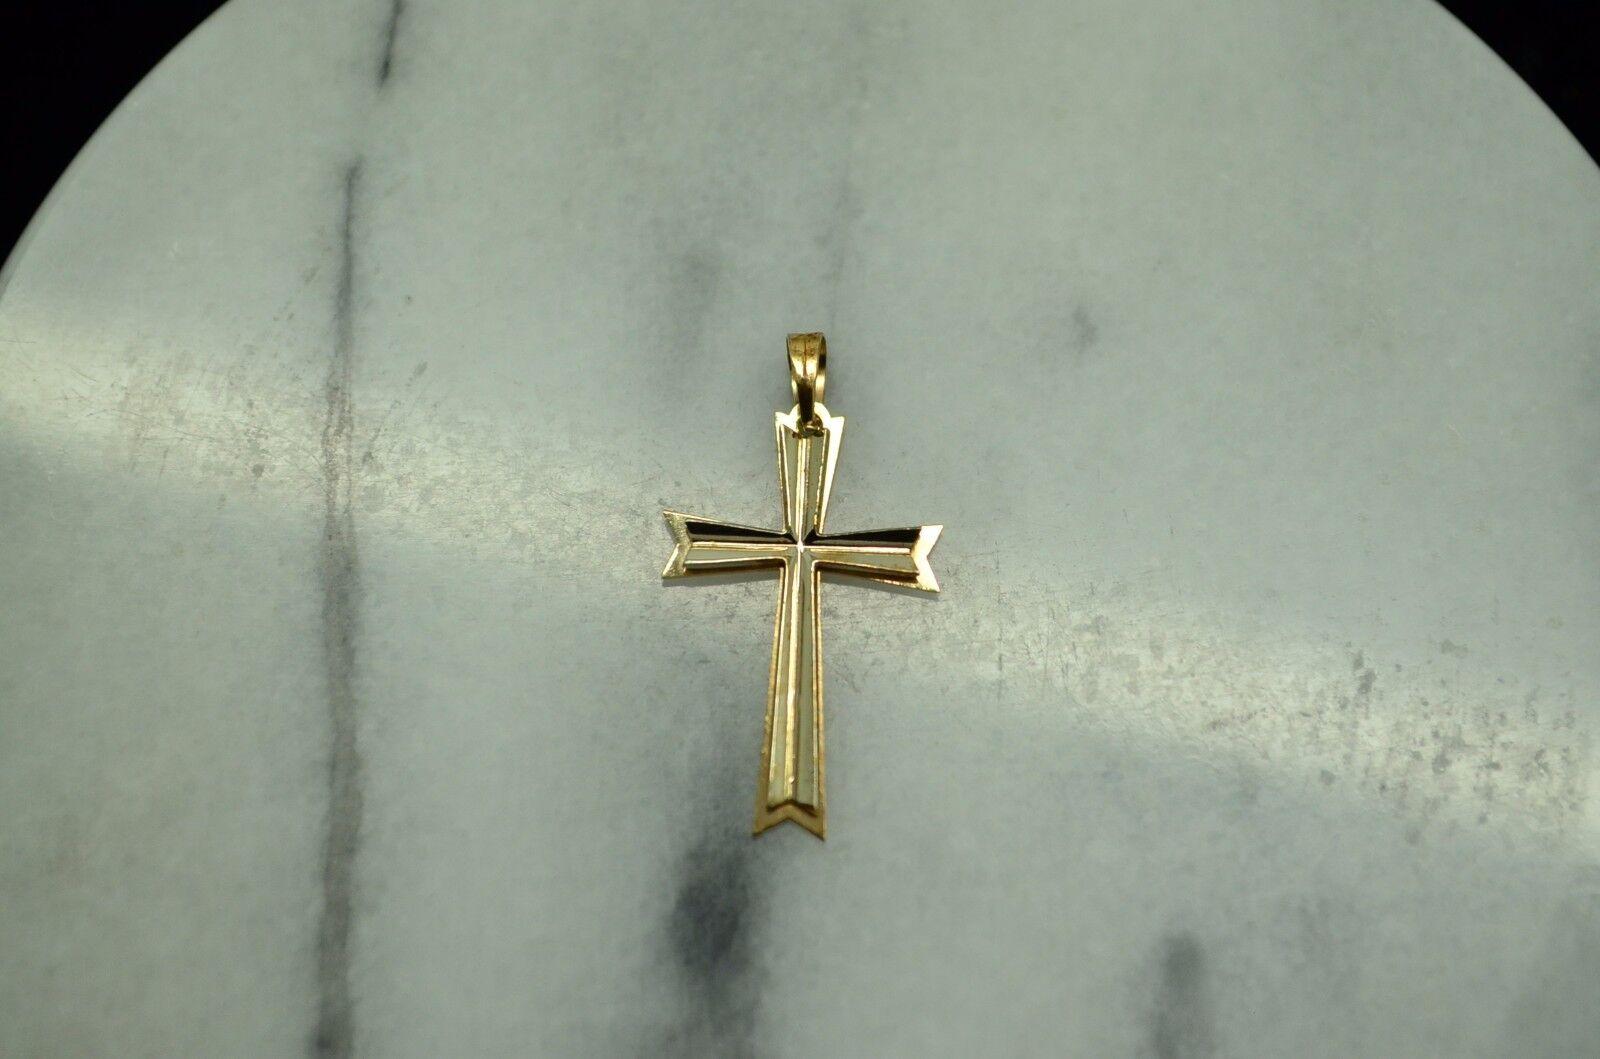 14K YELLOW gold SMALL CROSS PENDANT CHARM -FRAMED DESIGN